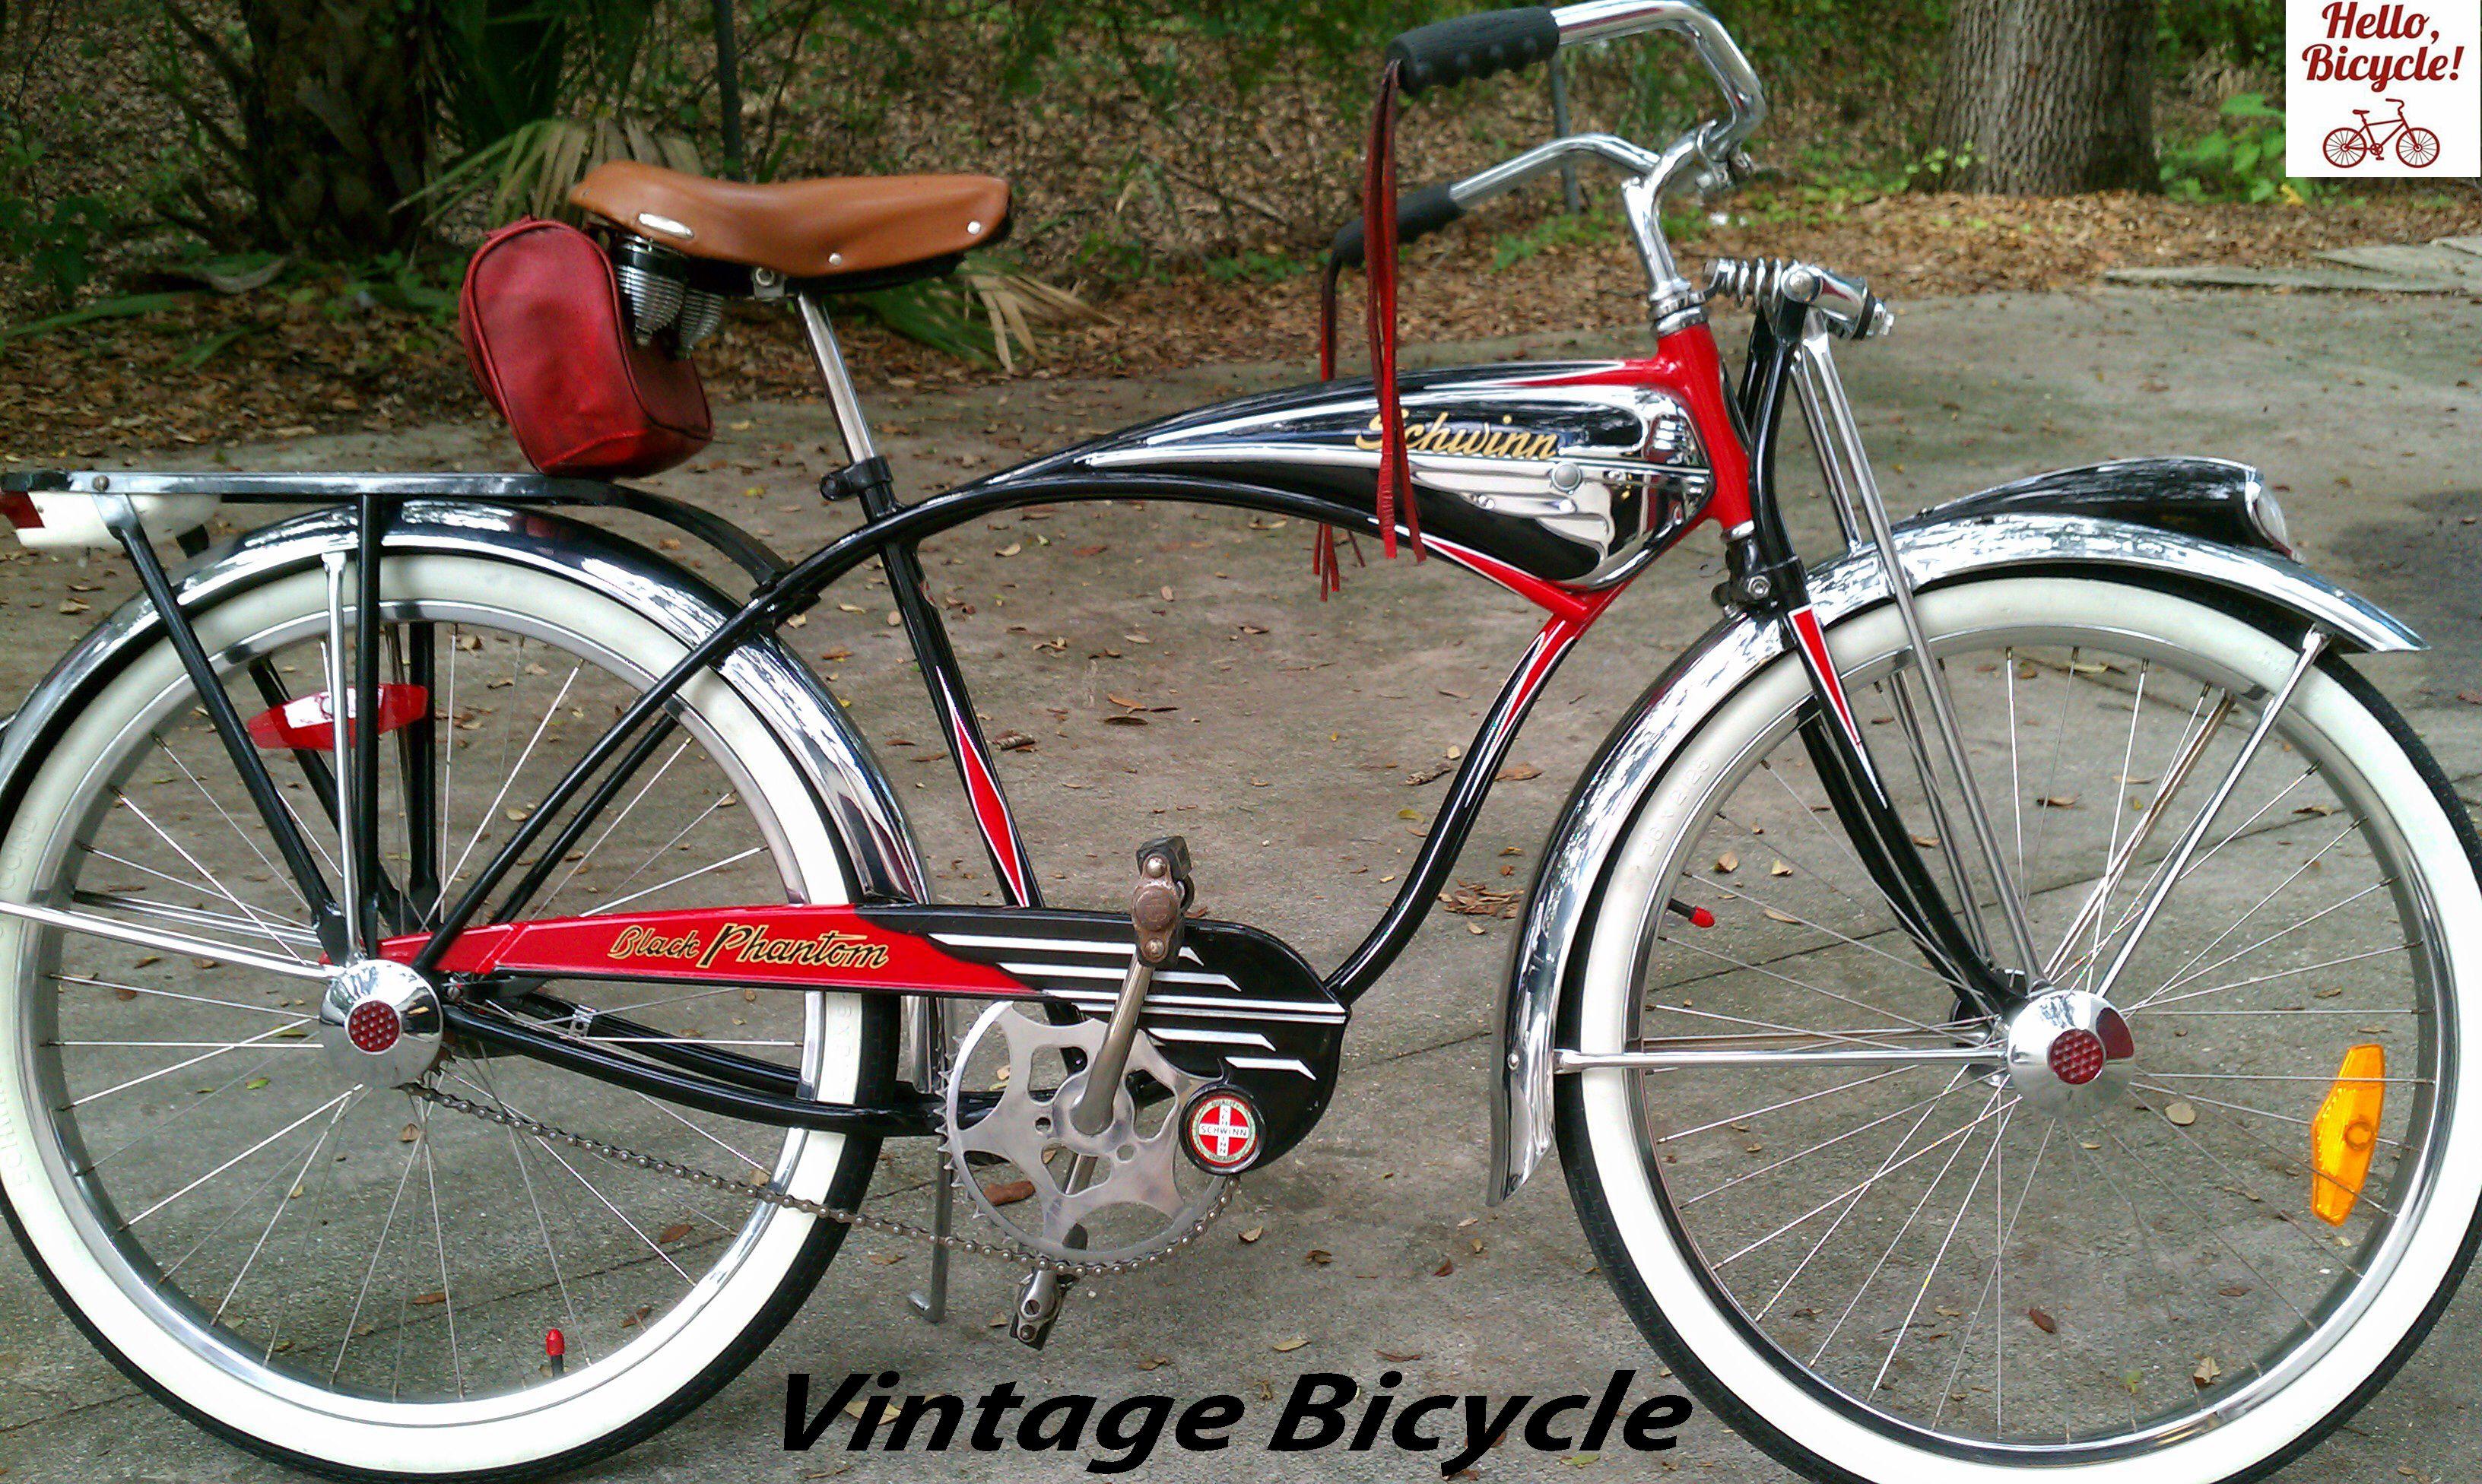 Hellobicycle Vintage Bikes Is The Online Shop For Vintage Bikes Classic Bikes Parts Vintage Apparel And Custom Constructed Bicycle Buy Bicycle Schwinn Bike